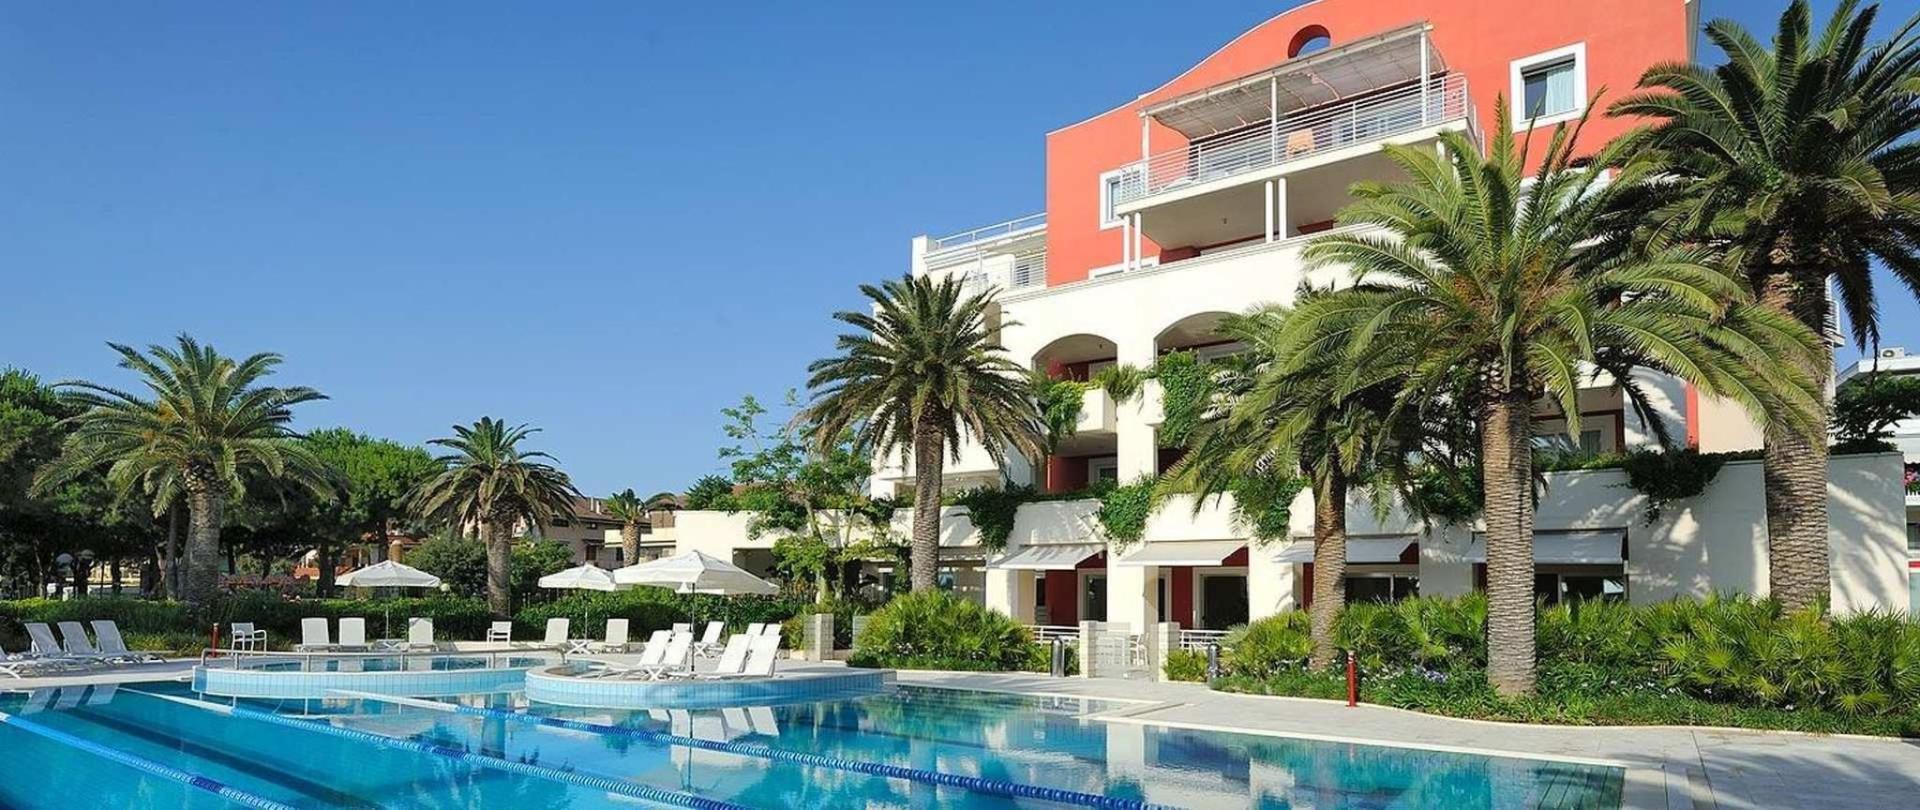 Valentino Resort - Grottammare - Italia